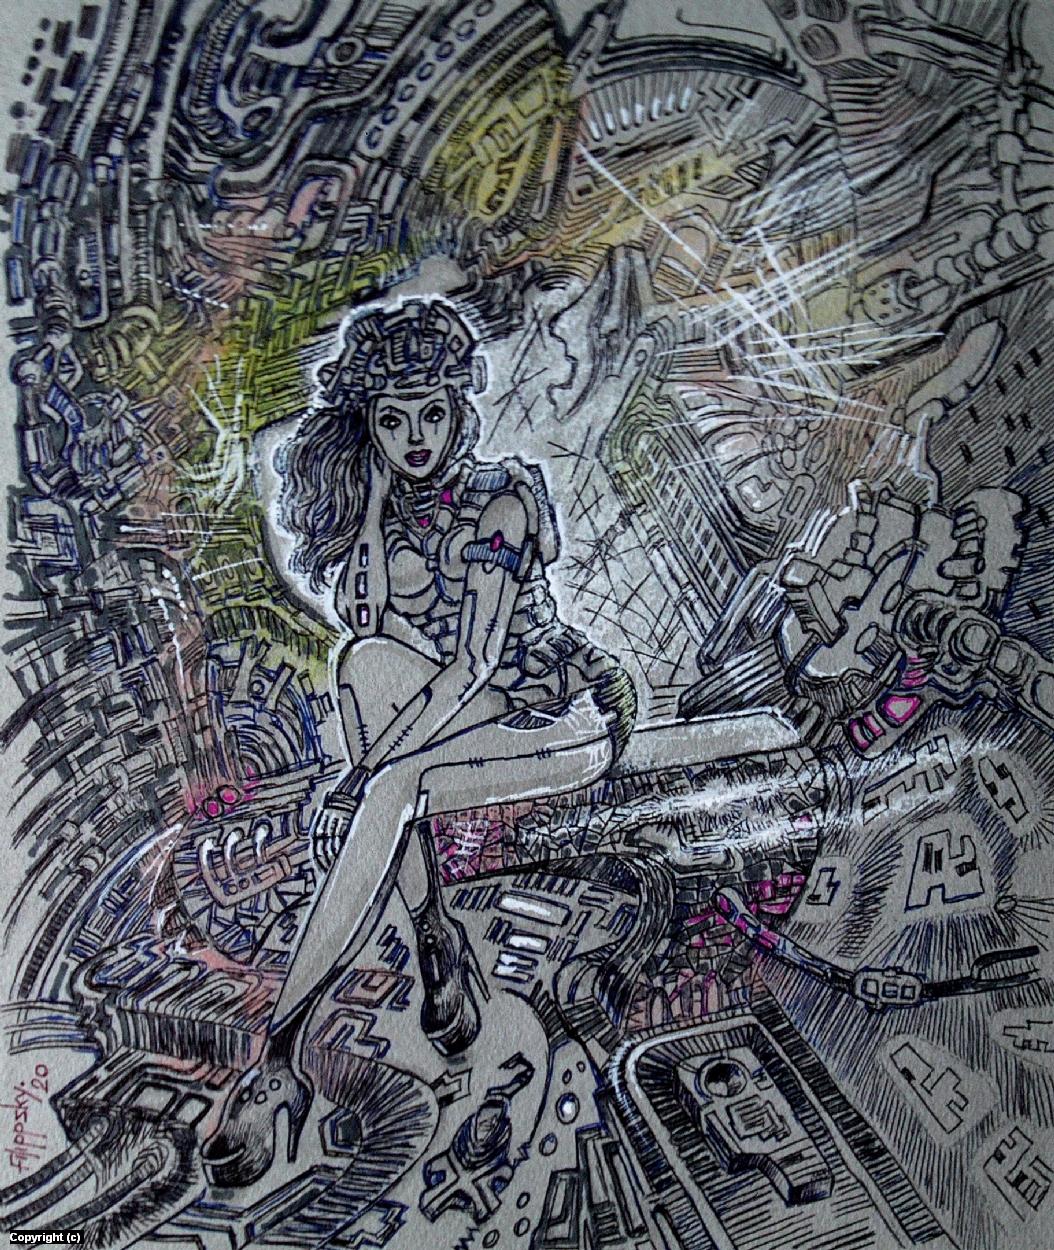 CyberPunk 1. Artwork by Victor Filippsky